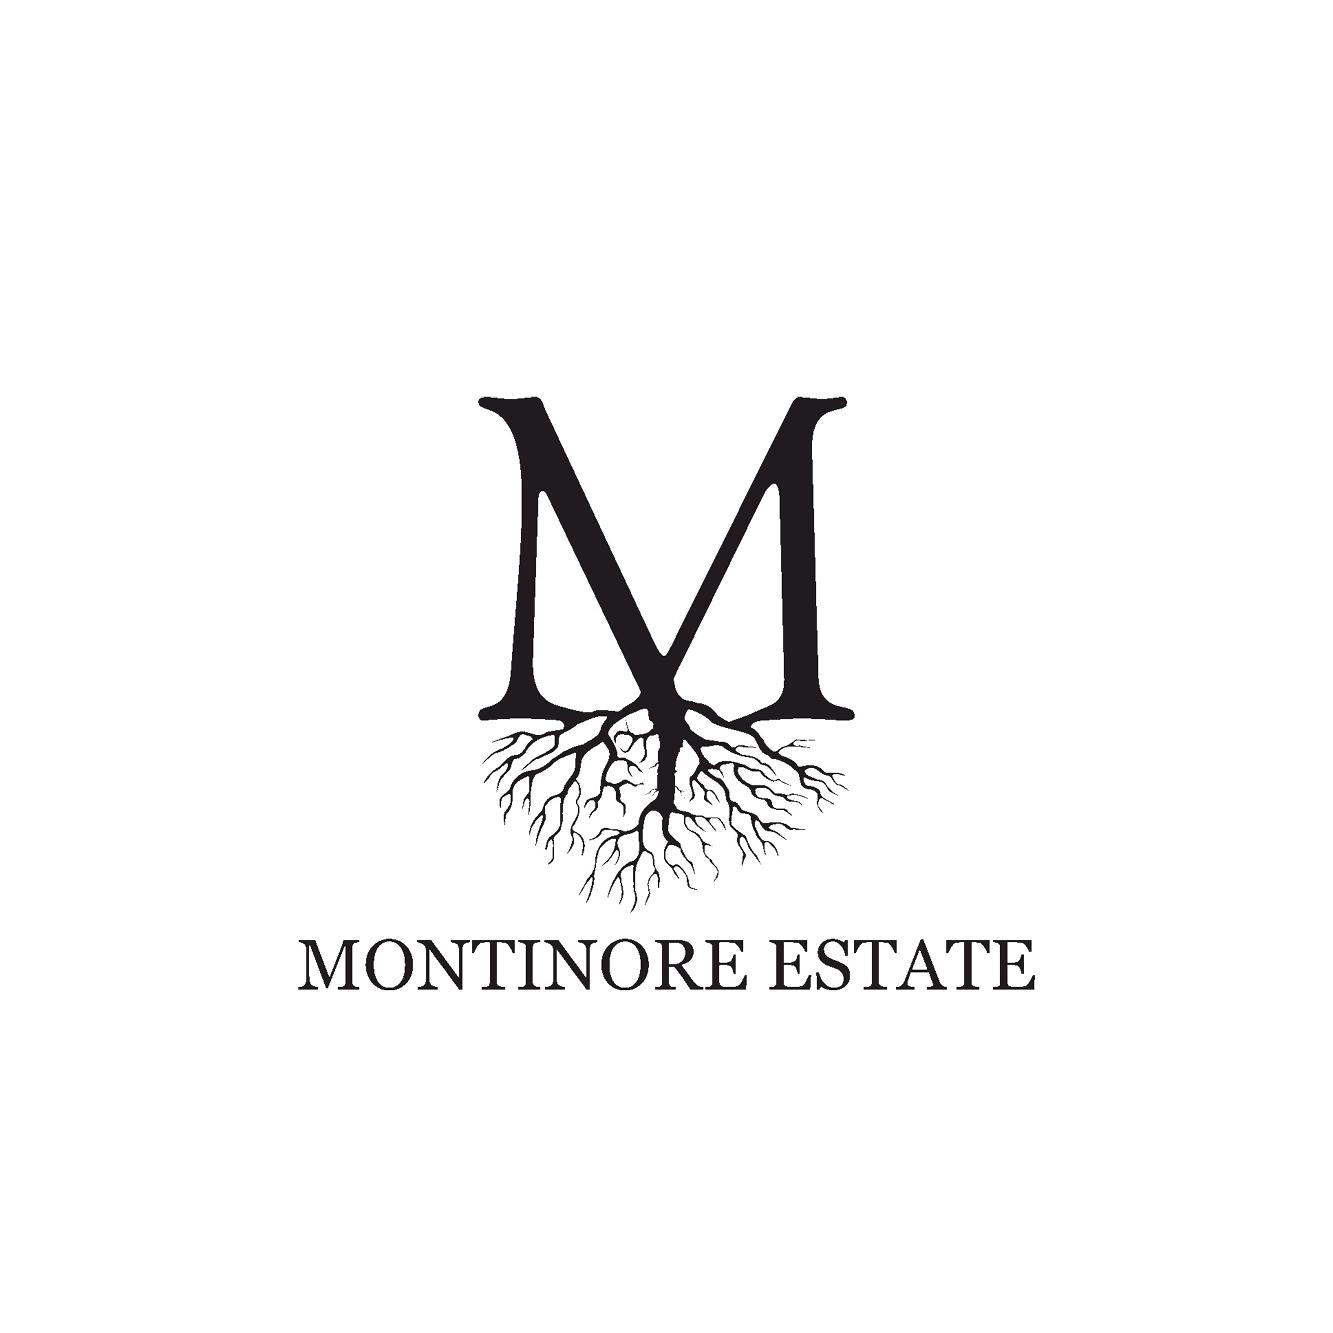 Winery Logos6.jpg